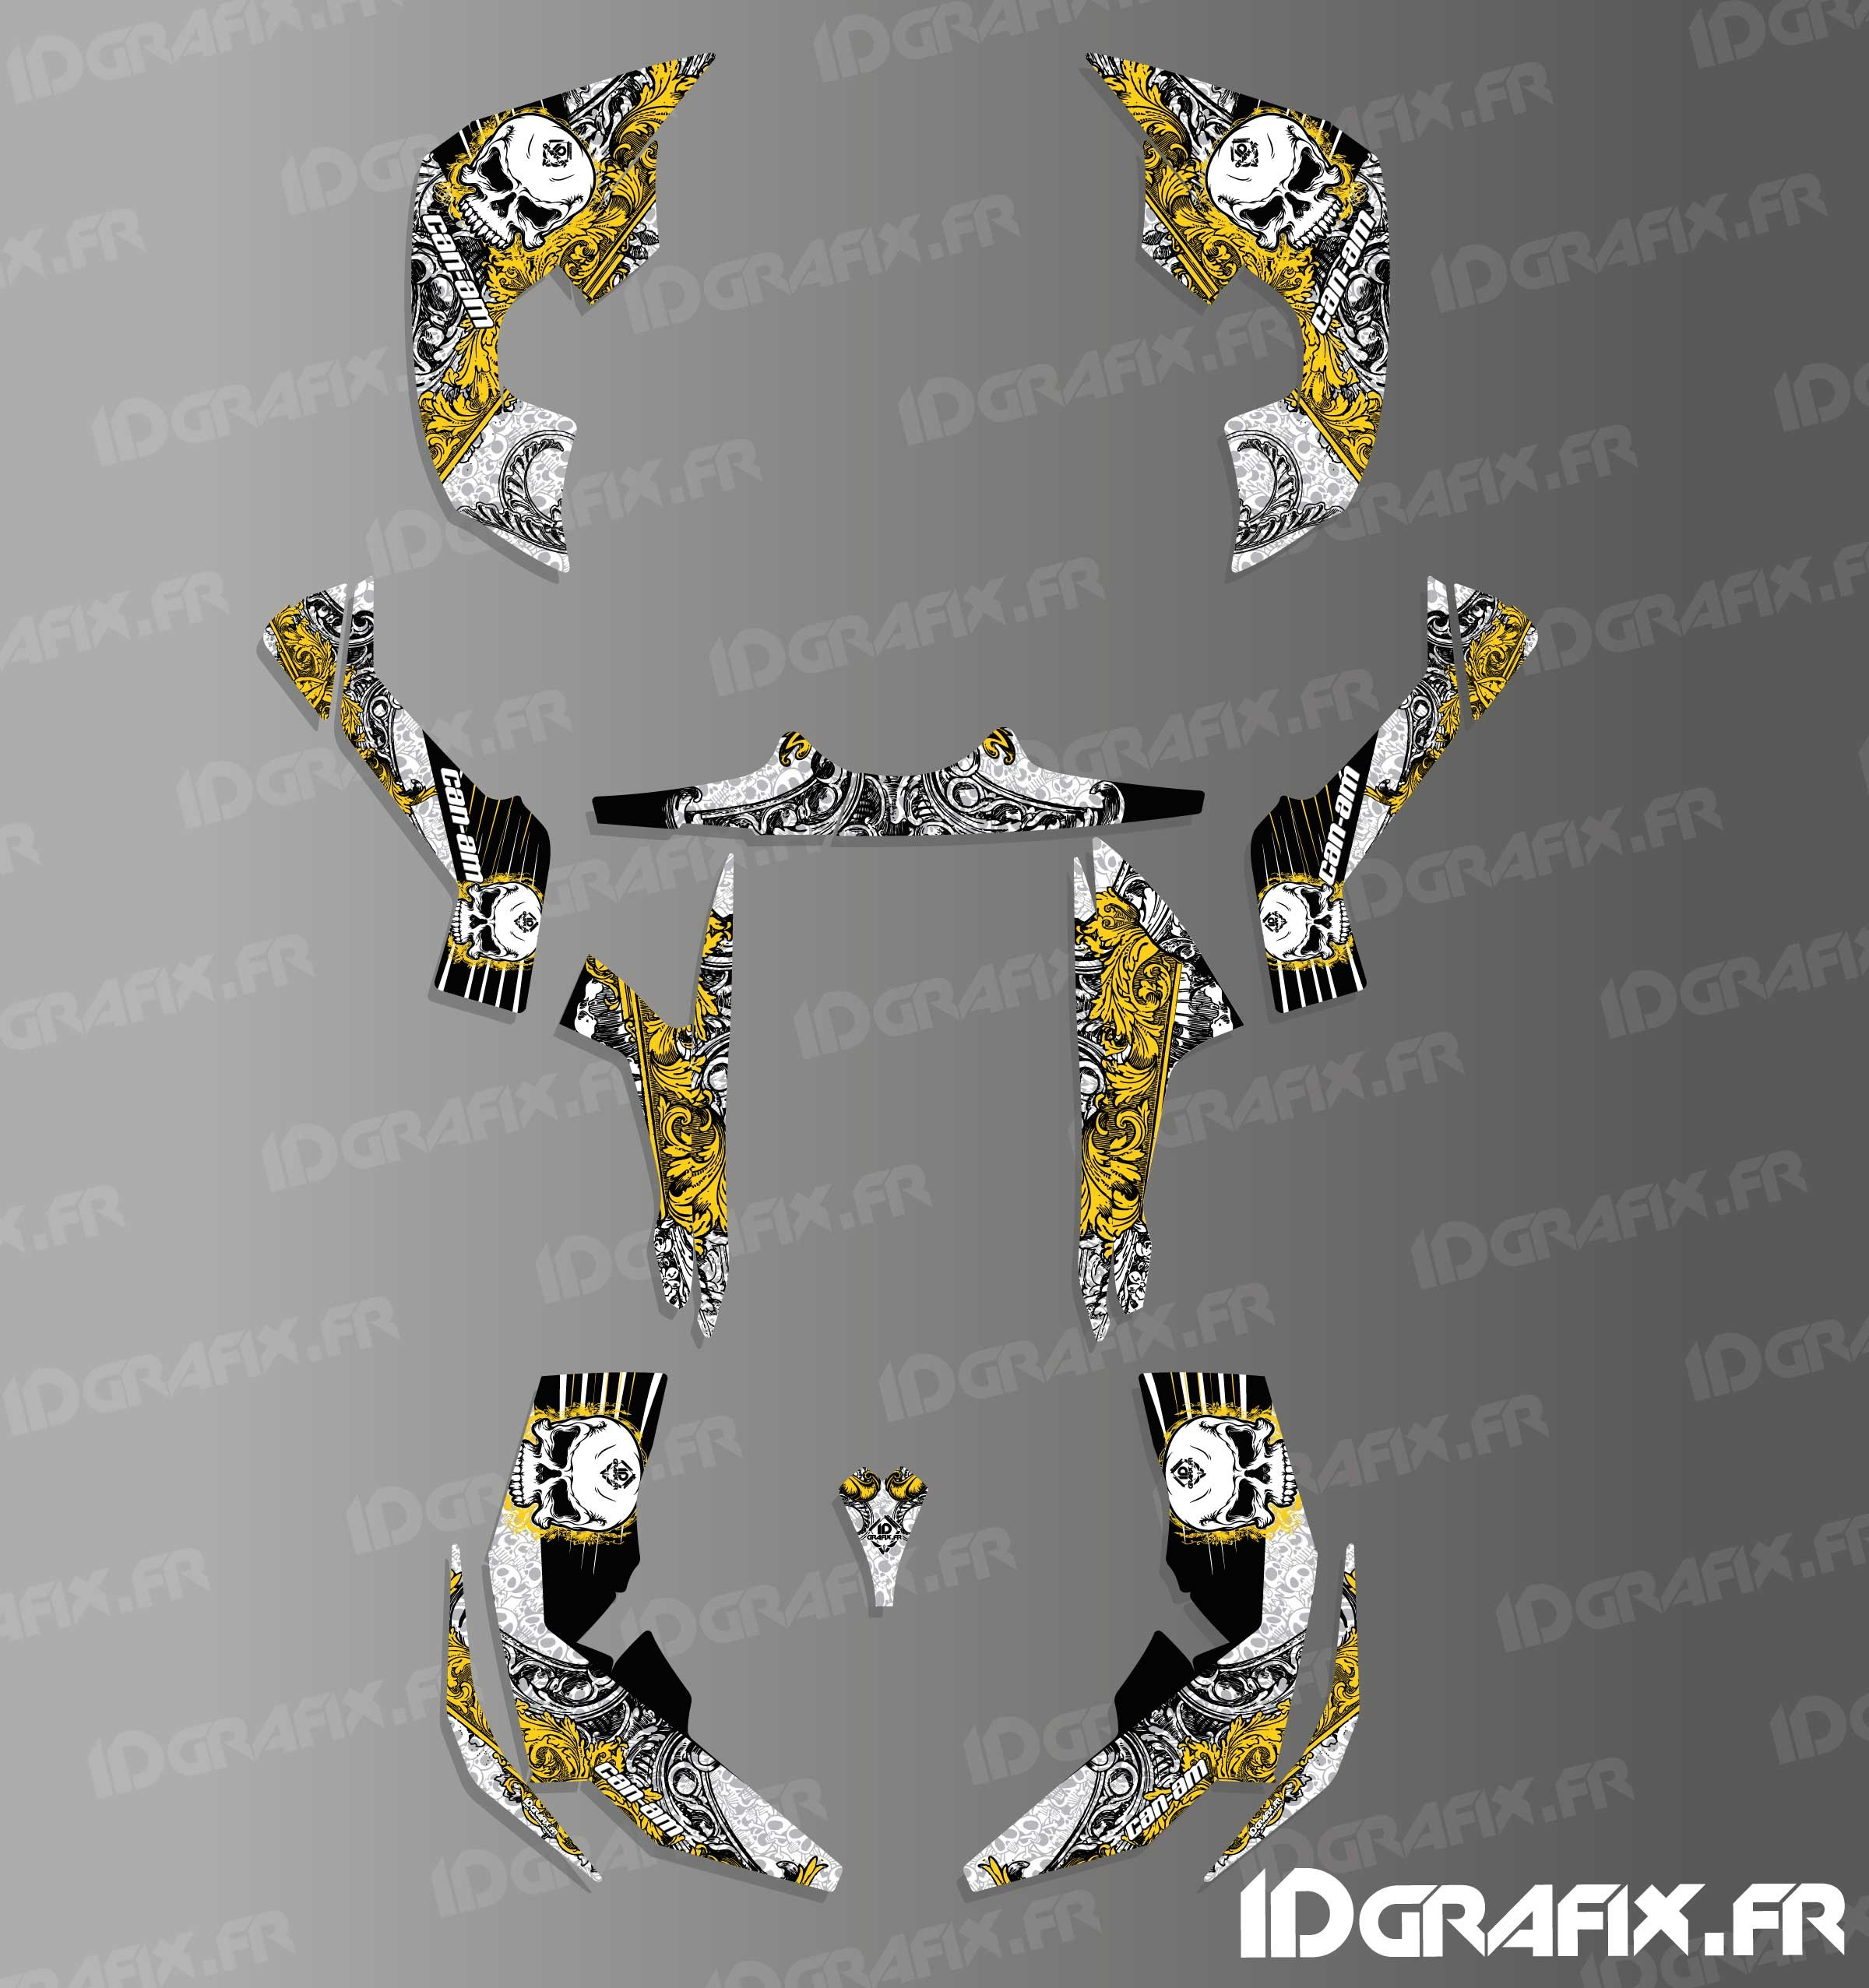 kit de decoracin de crneo de la serie completa amarillo idgrafix can